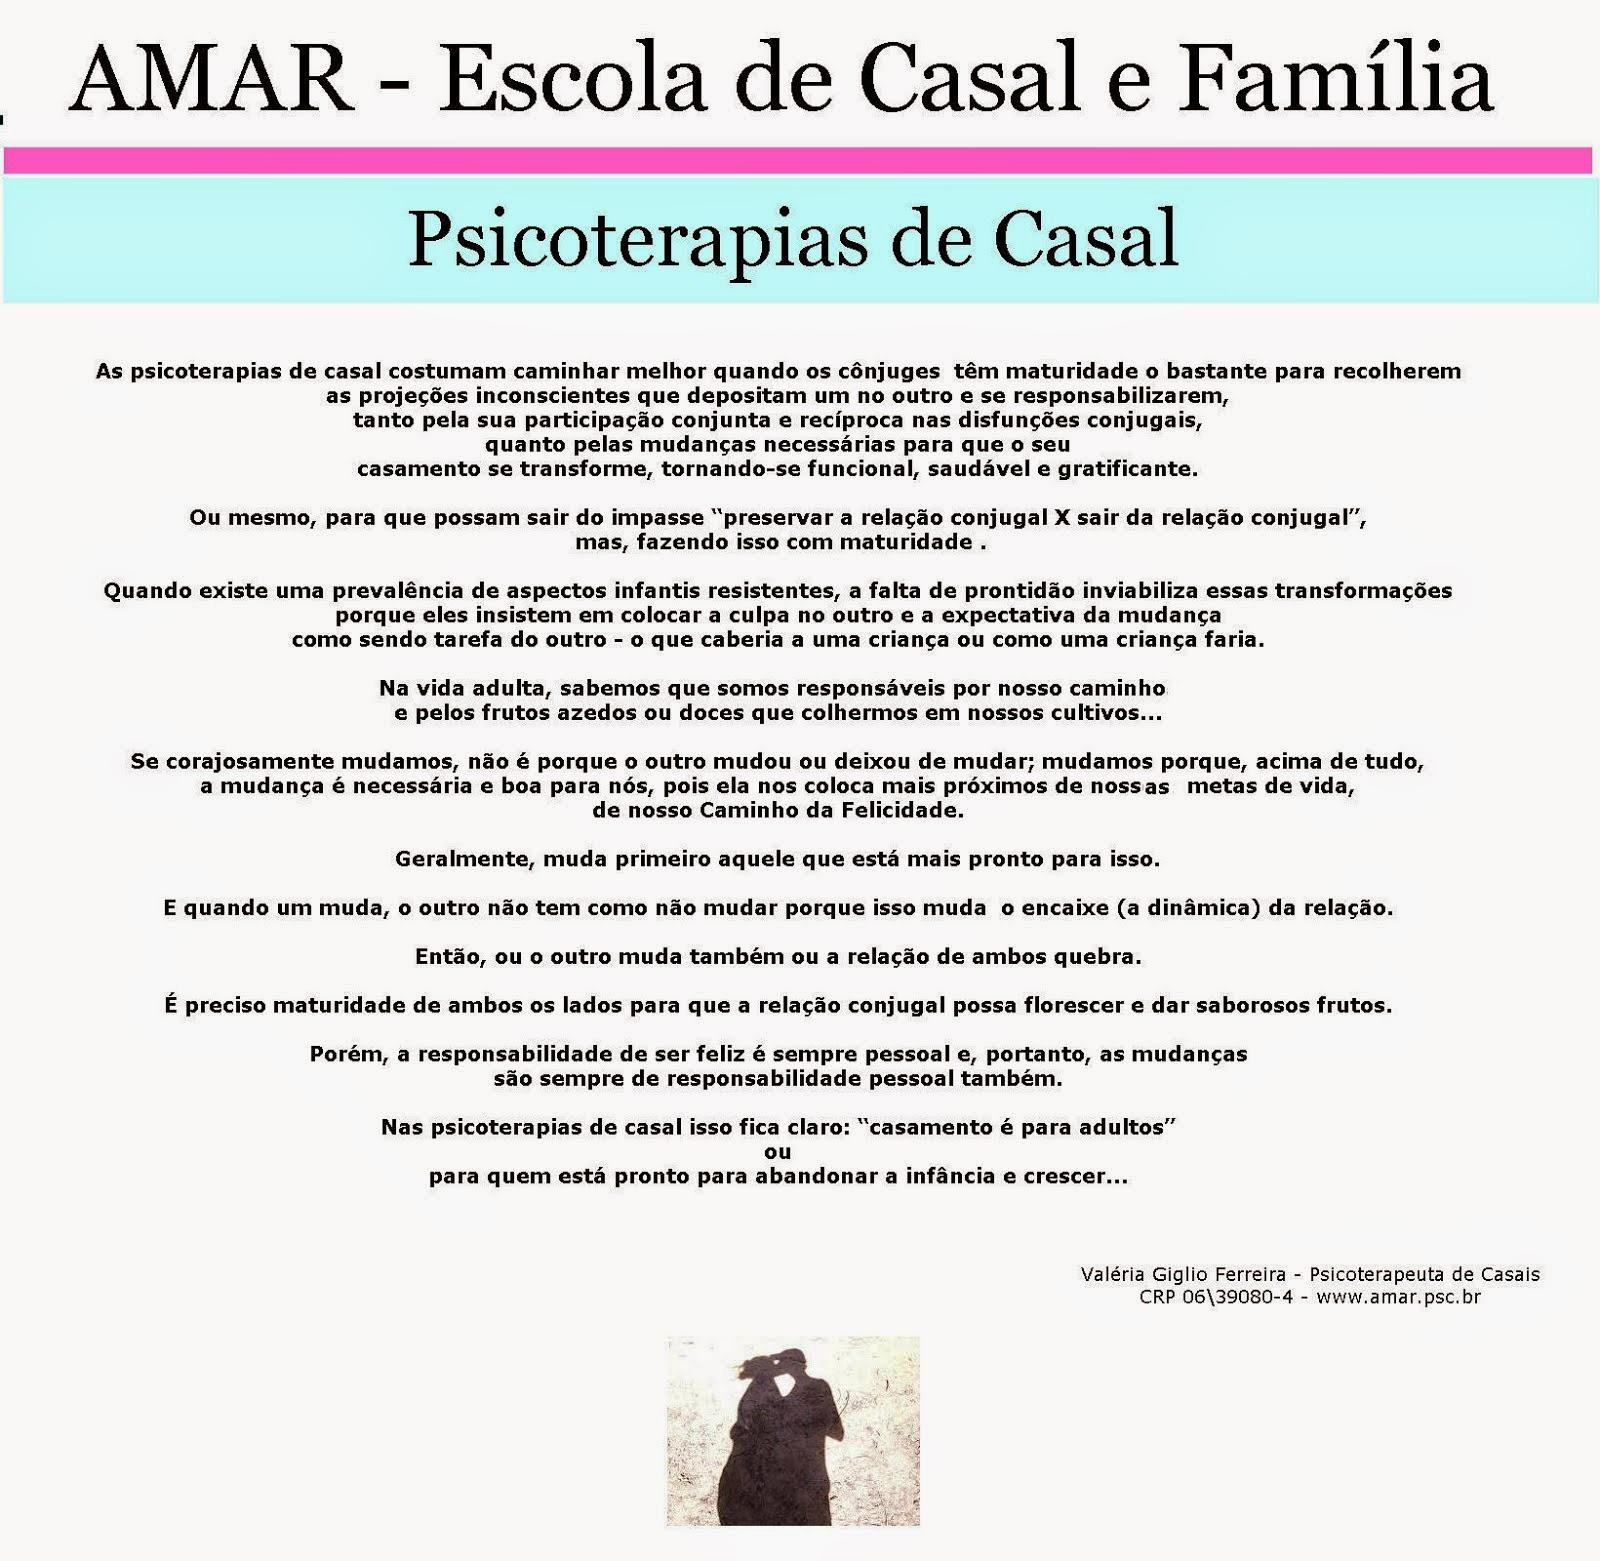 Psicoterapias de Casal - Texto revisado